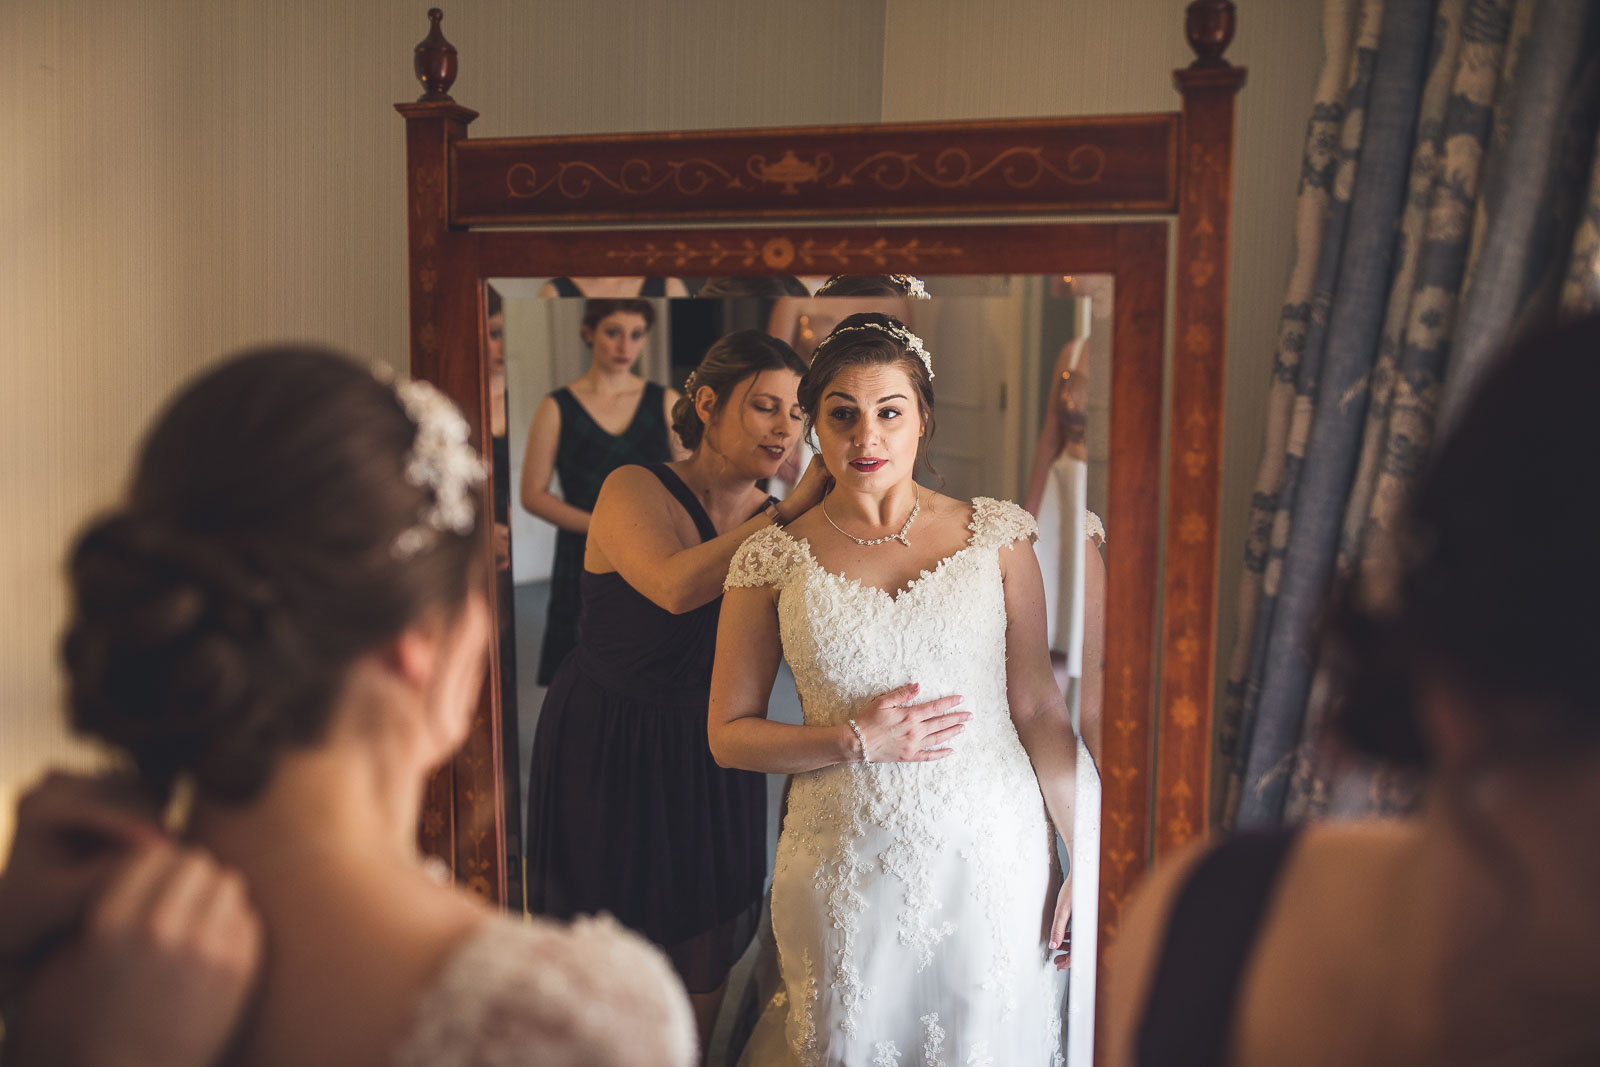 Bride getting final details